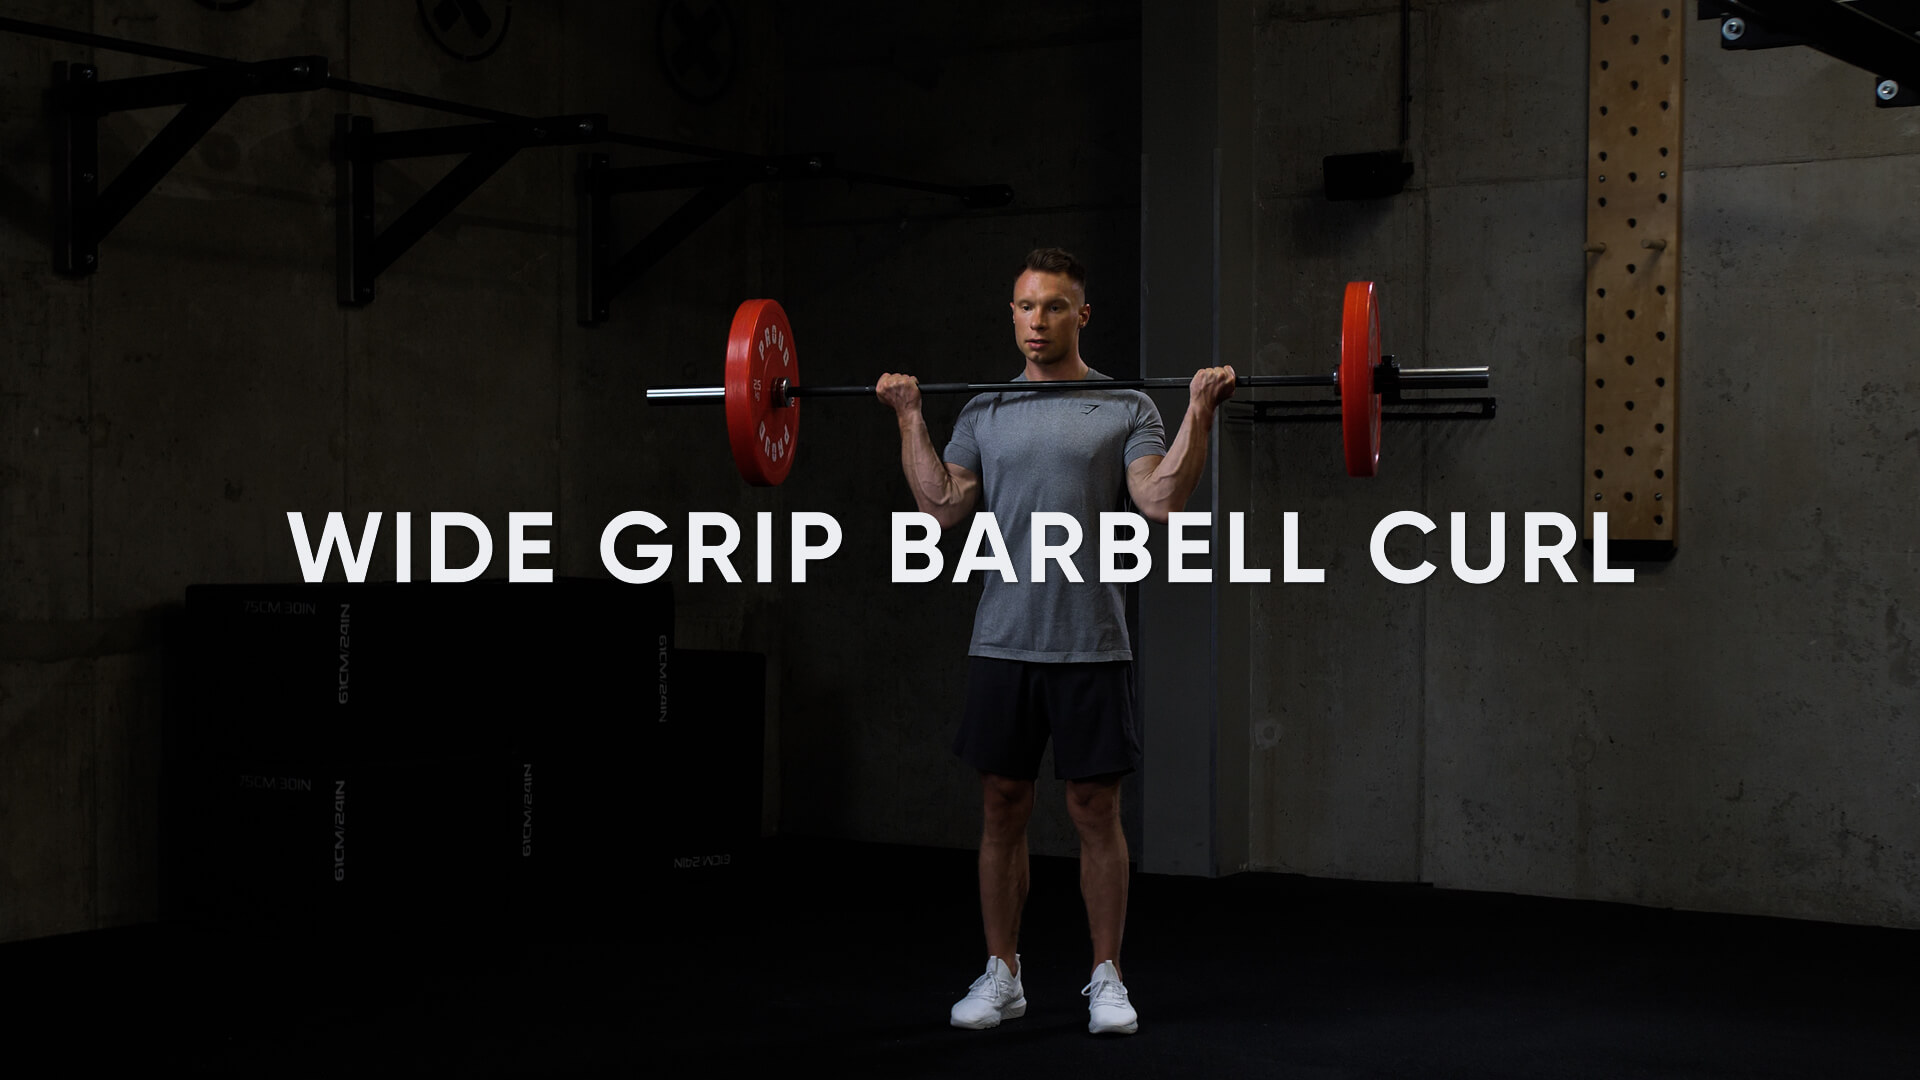 Wide Grip Barbell Curl